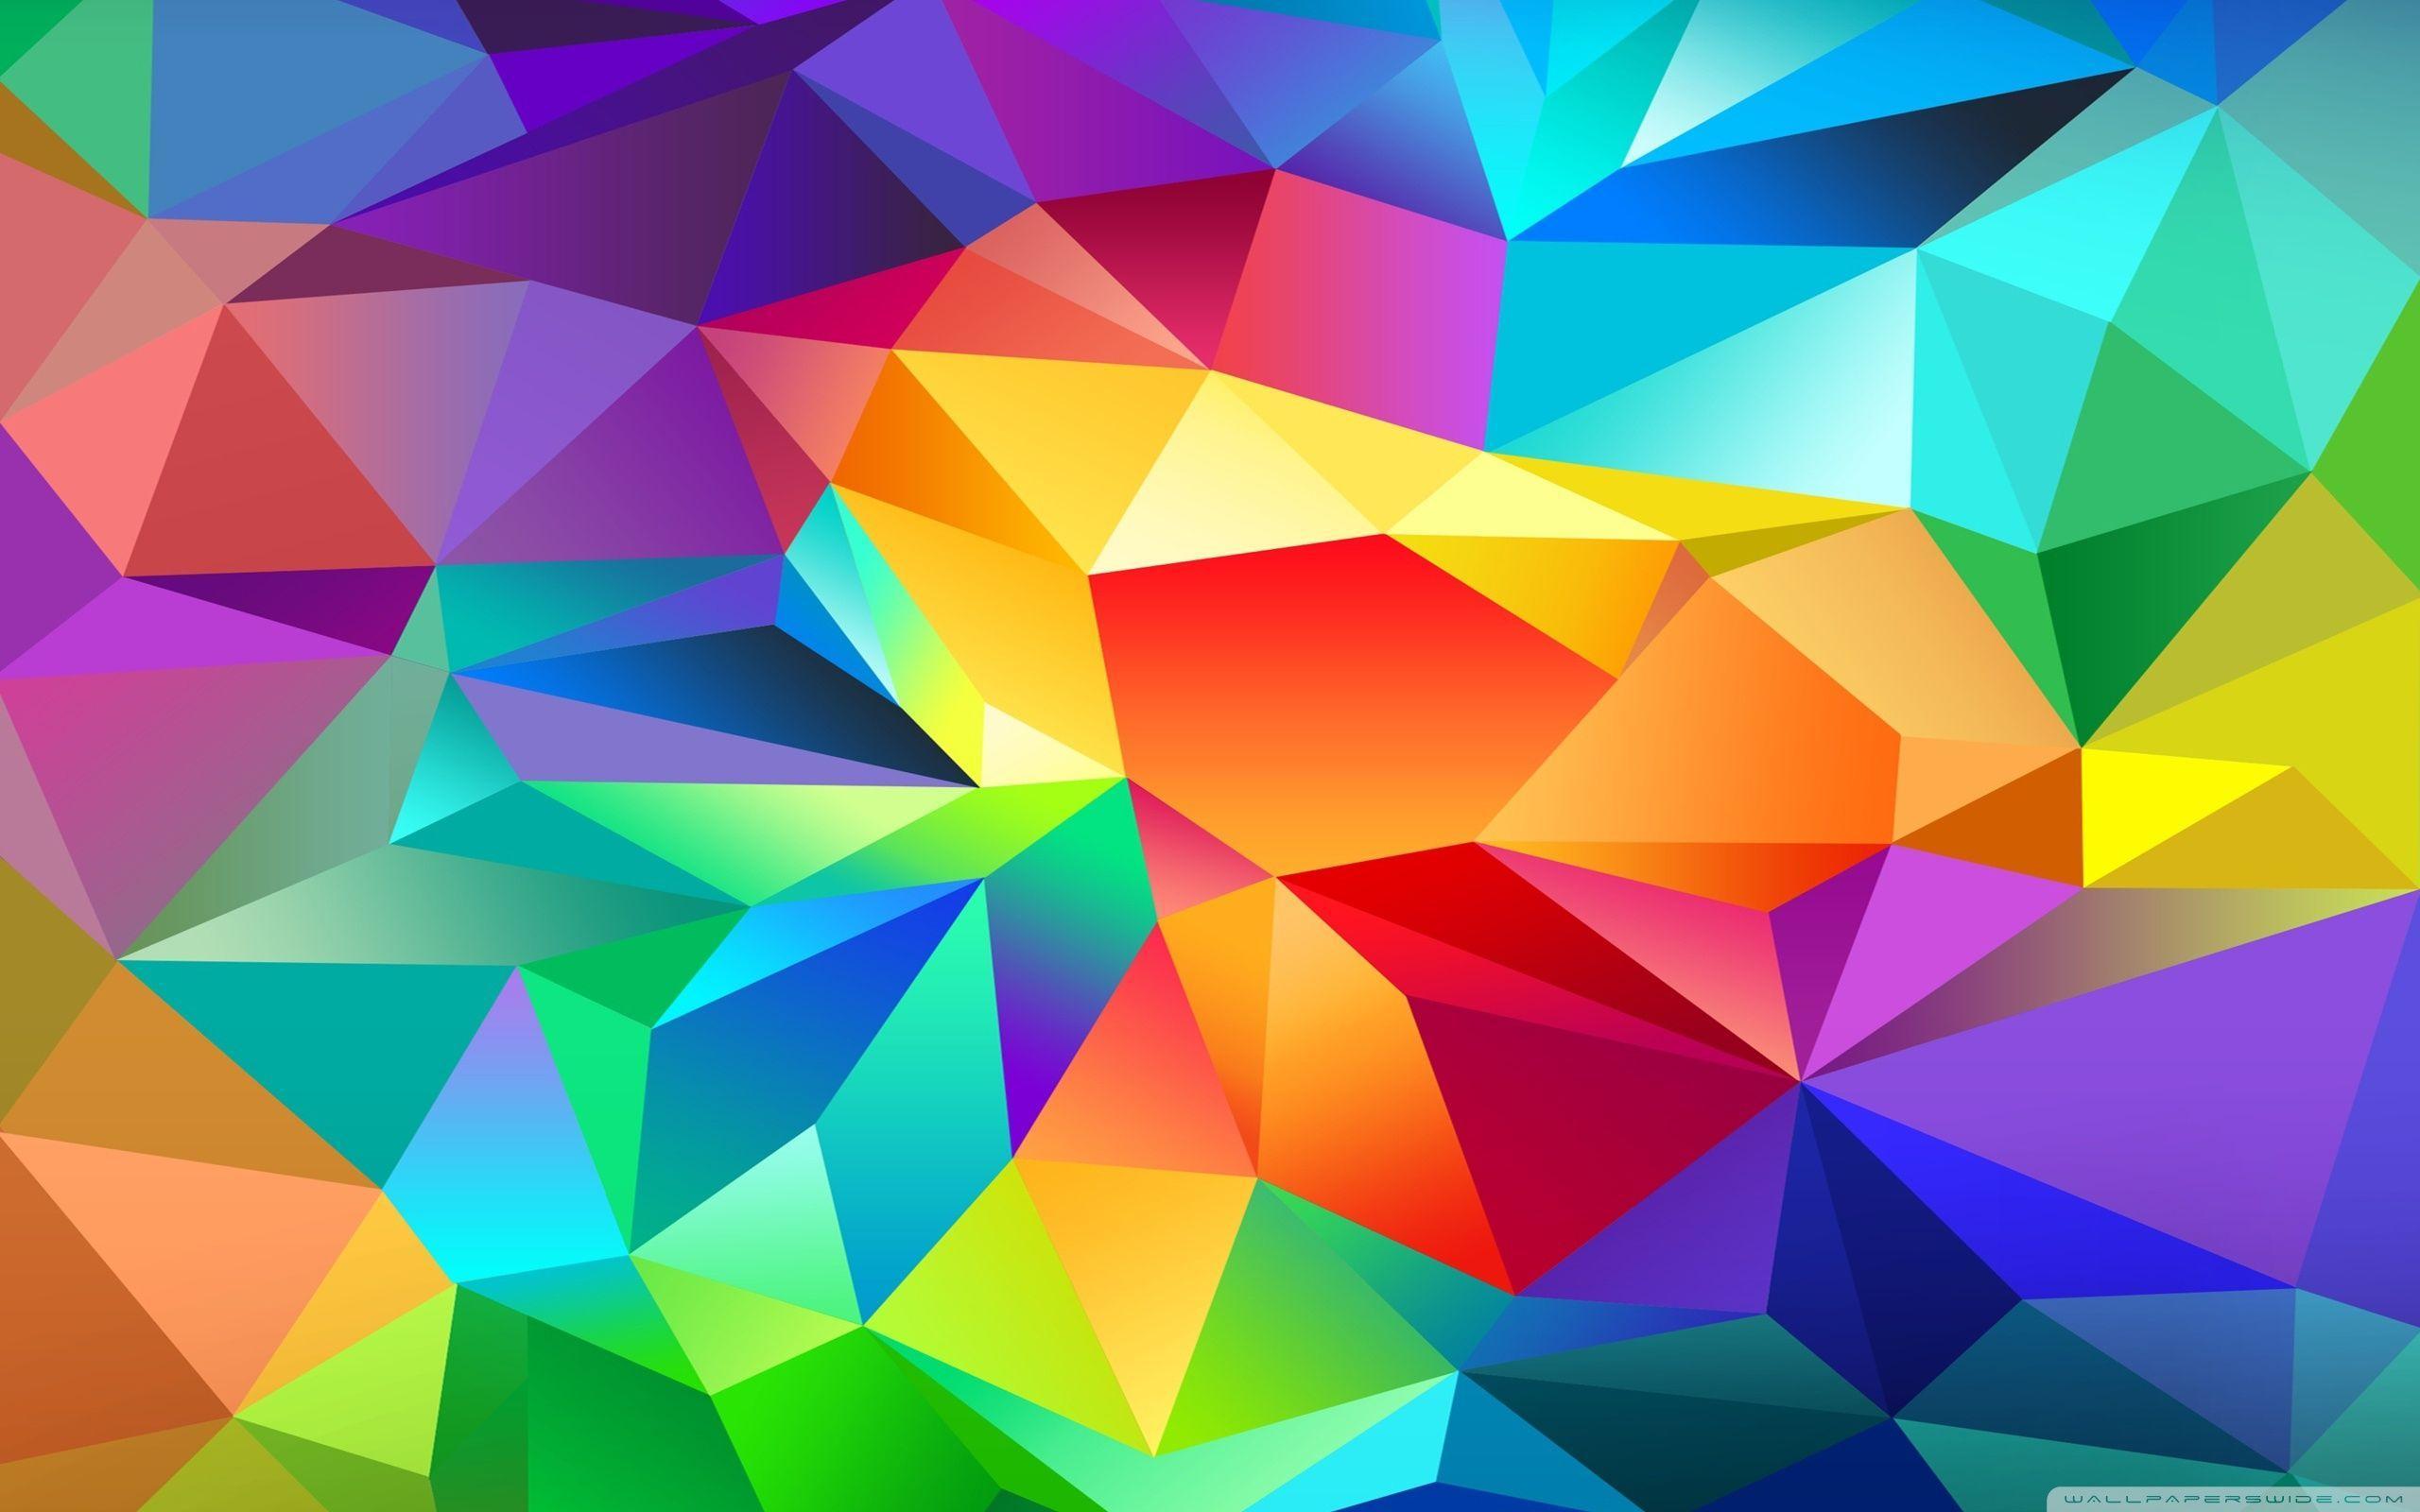 Samsung Galaxy Desktop Wallpapers Wallpaper Cave